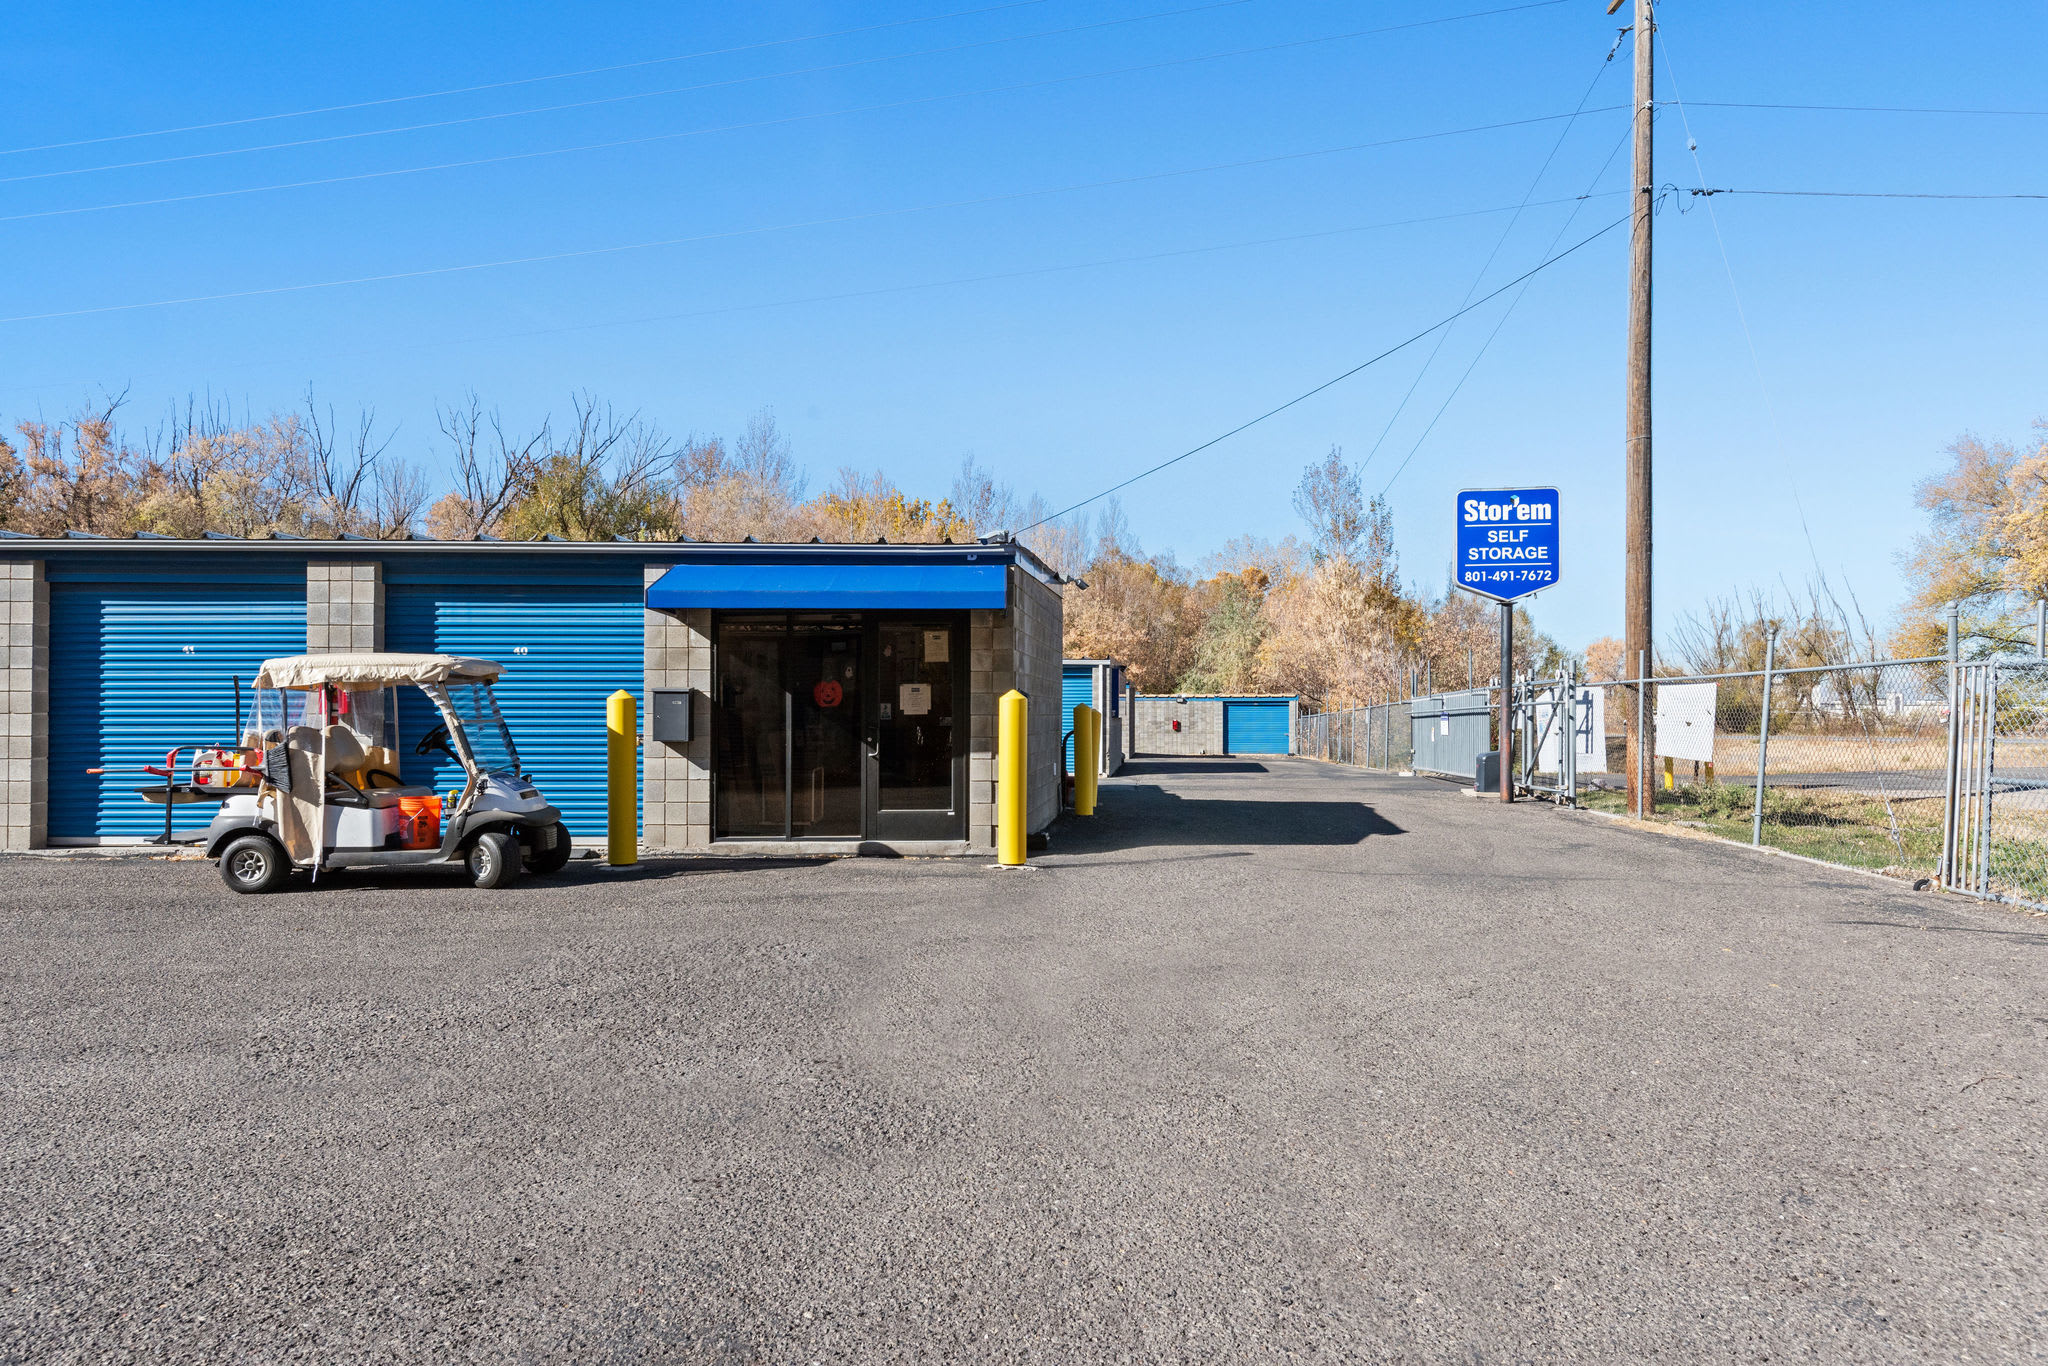 Exterior storage units for rent at Stor'em Self Storage in Springville, Utah